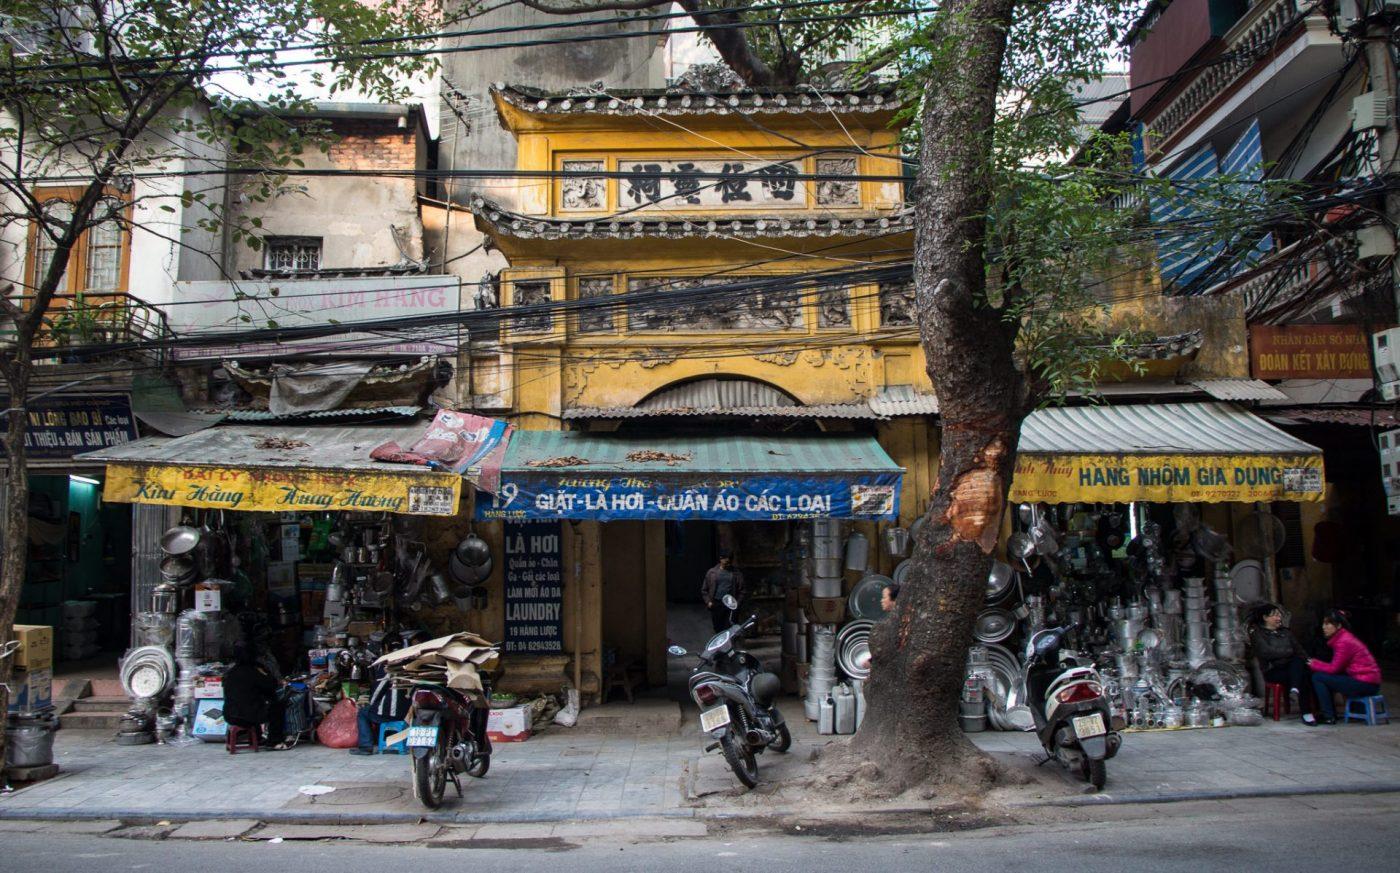 Decadent historic buildings in Hanoi